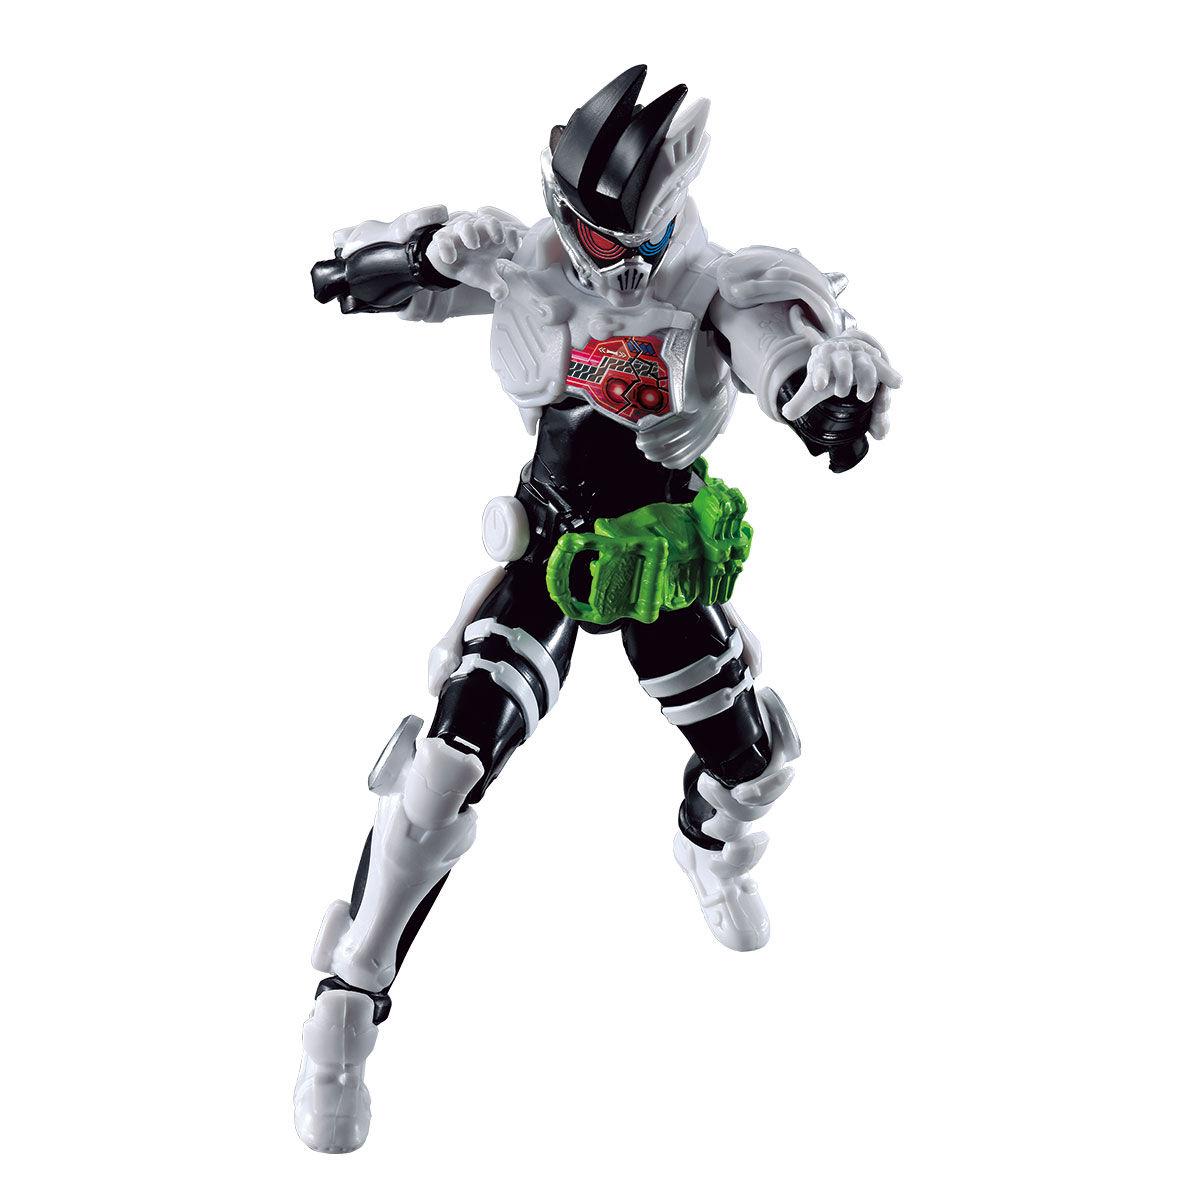 RKFレジェンドライダーシリーズ『仮面ライダーゲンム ゾンビゲーマー』可動フィギュア-002